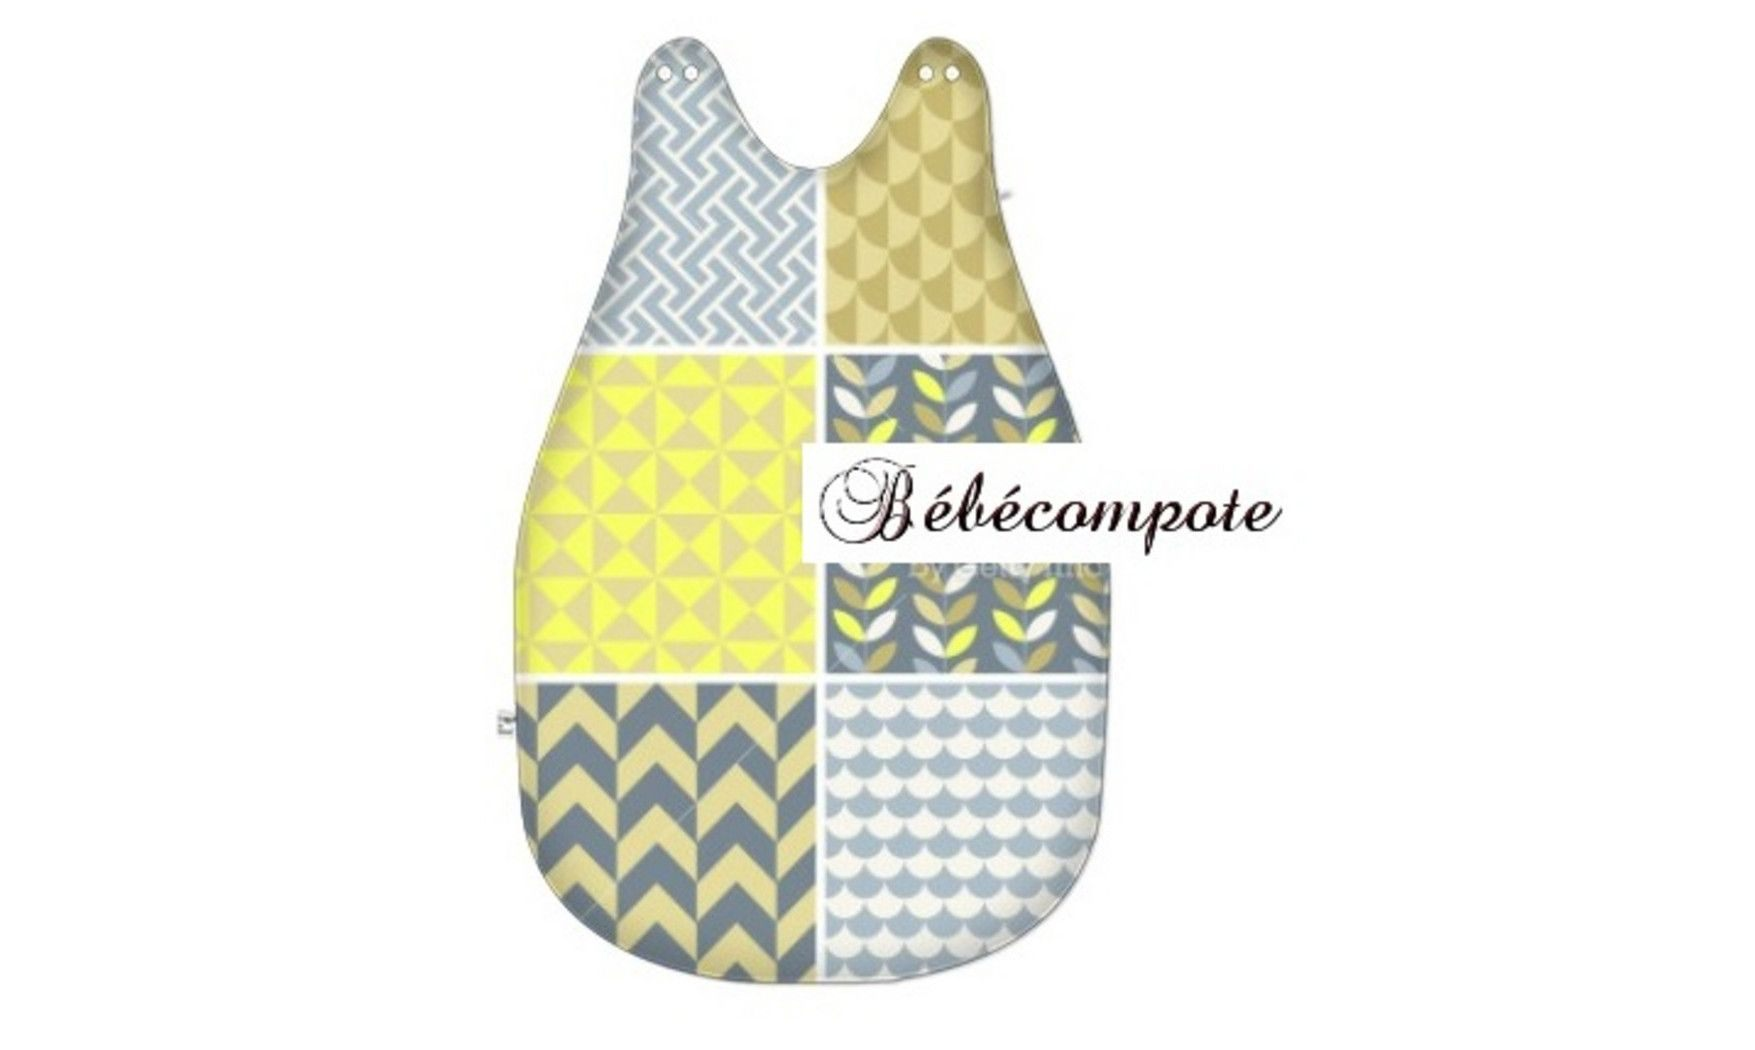 Linge De Lit Fille Luxe Gigoteuse Style Tissu Patchwork Cadeau Bebe Pote